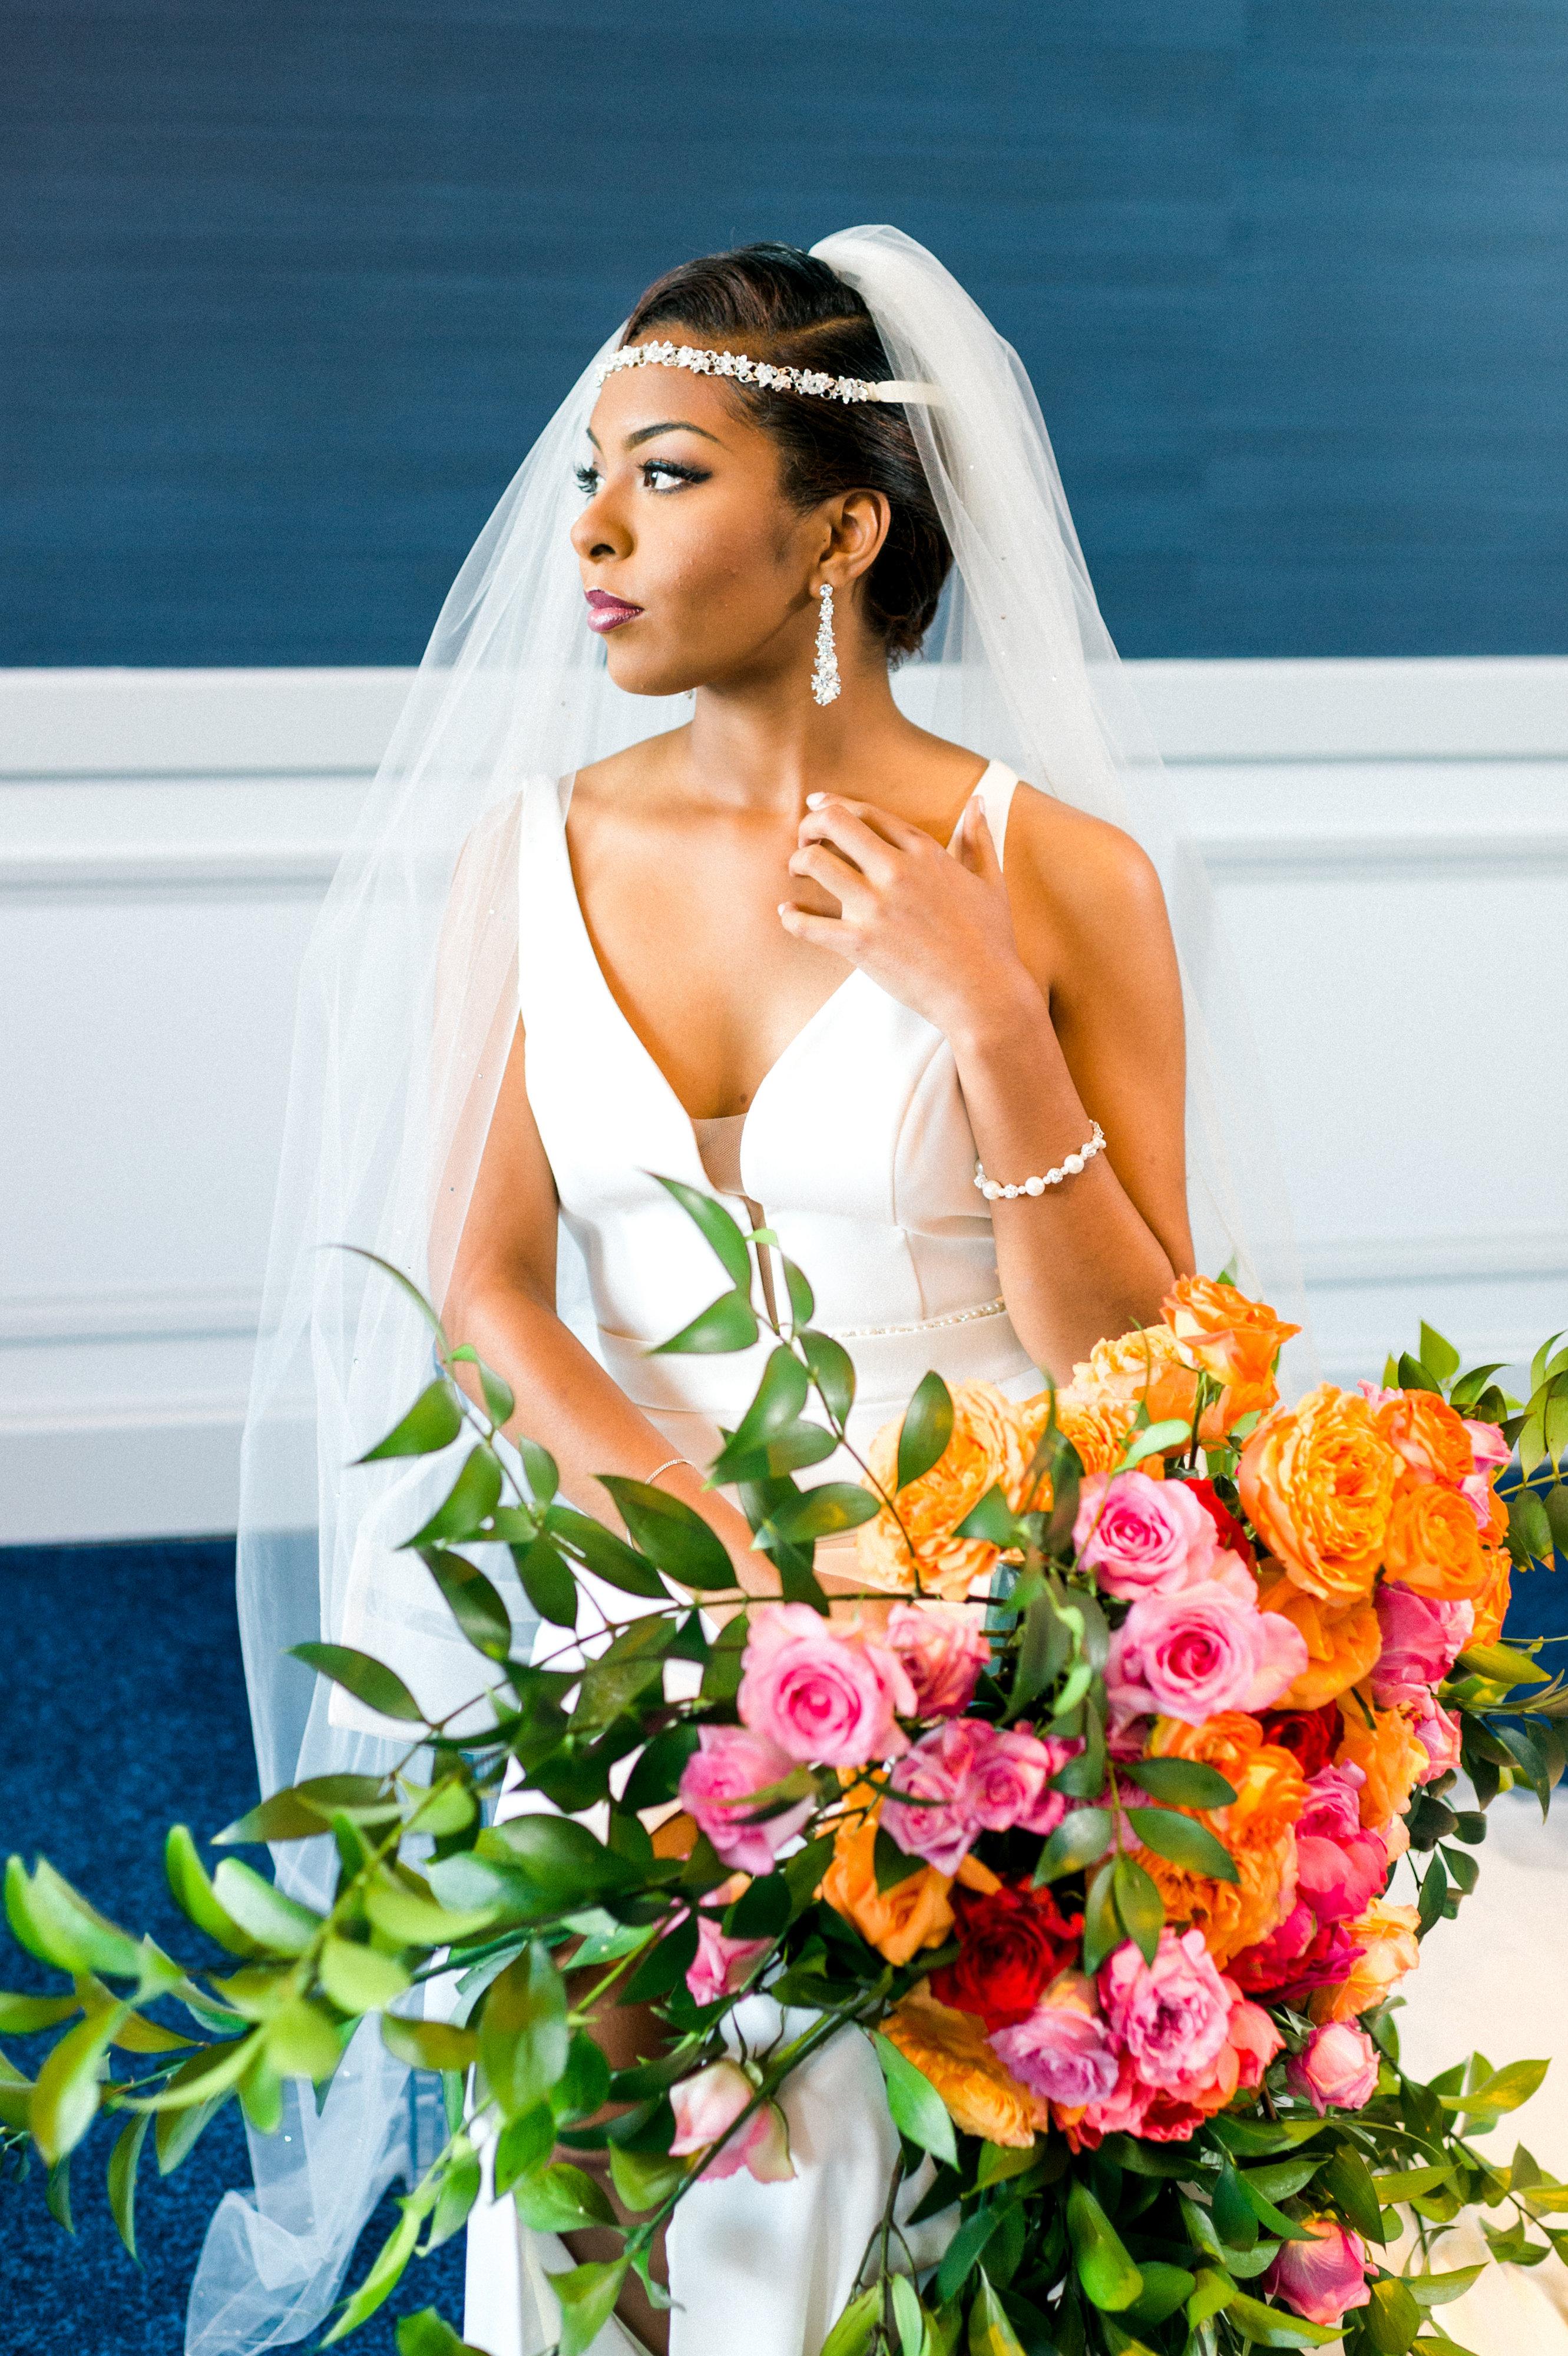 E'MAGNE Events & Co - North Carolina luxury wedding planner - branded logo - orange and navy blue wedding - bride with orange and fuchsia bouquet